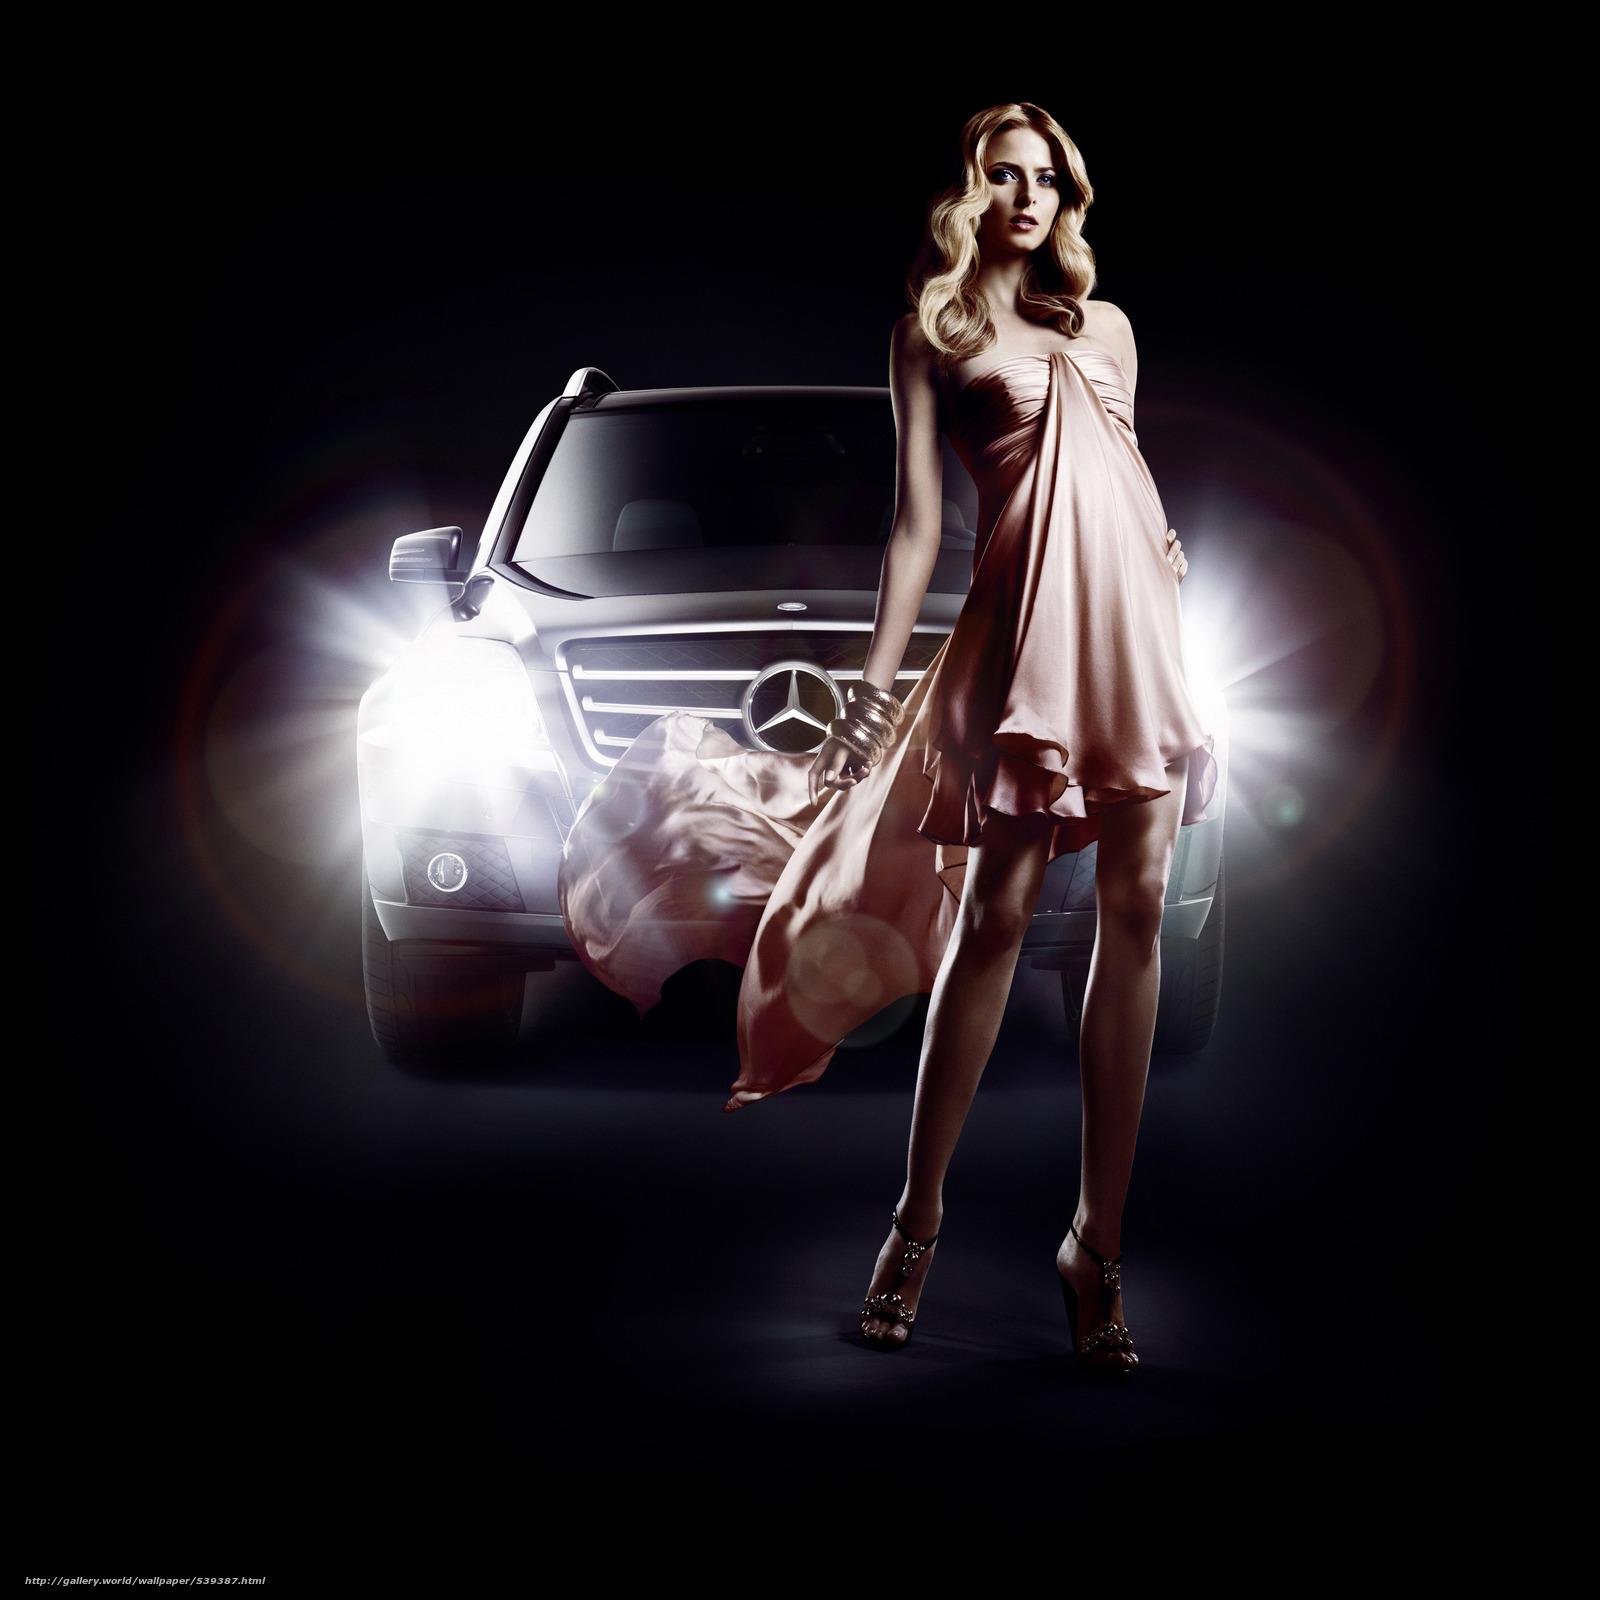 Download wallpaper Eva Padberg,  Mercedes-Benz,  GLK,  fashion free desktop wallpaper in the resolution 3000x3000 — picture №539387